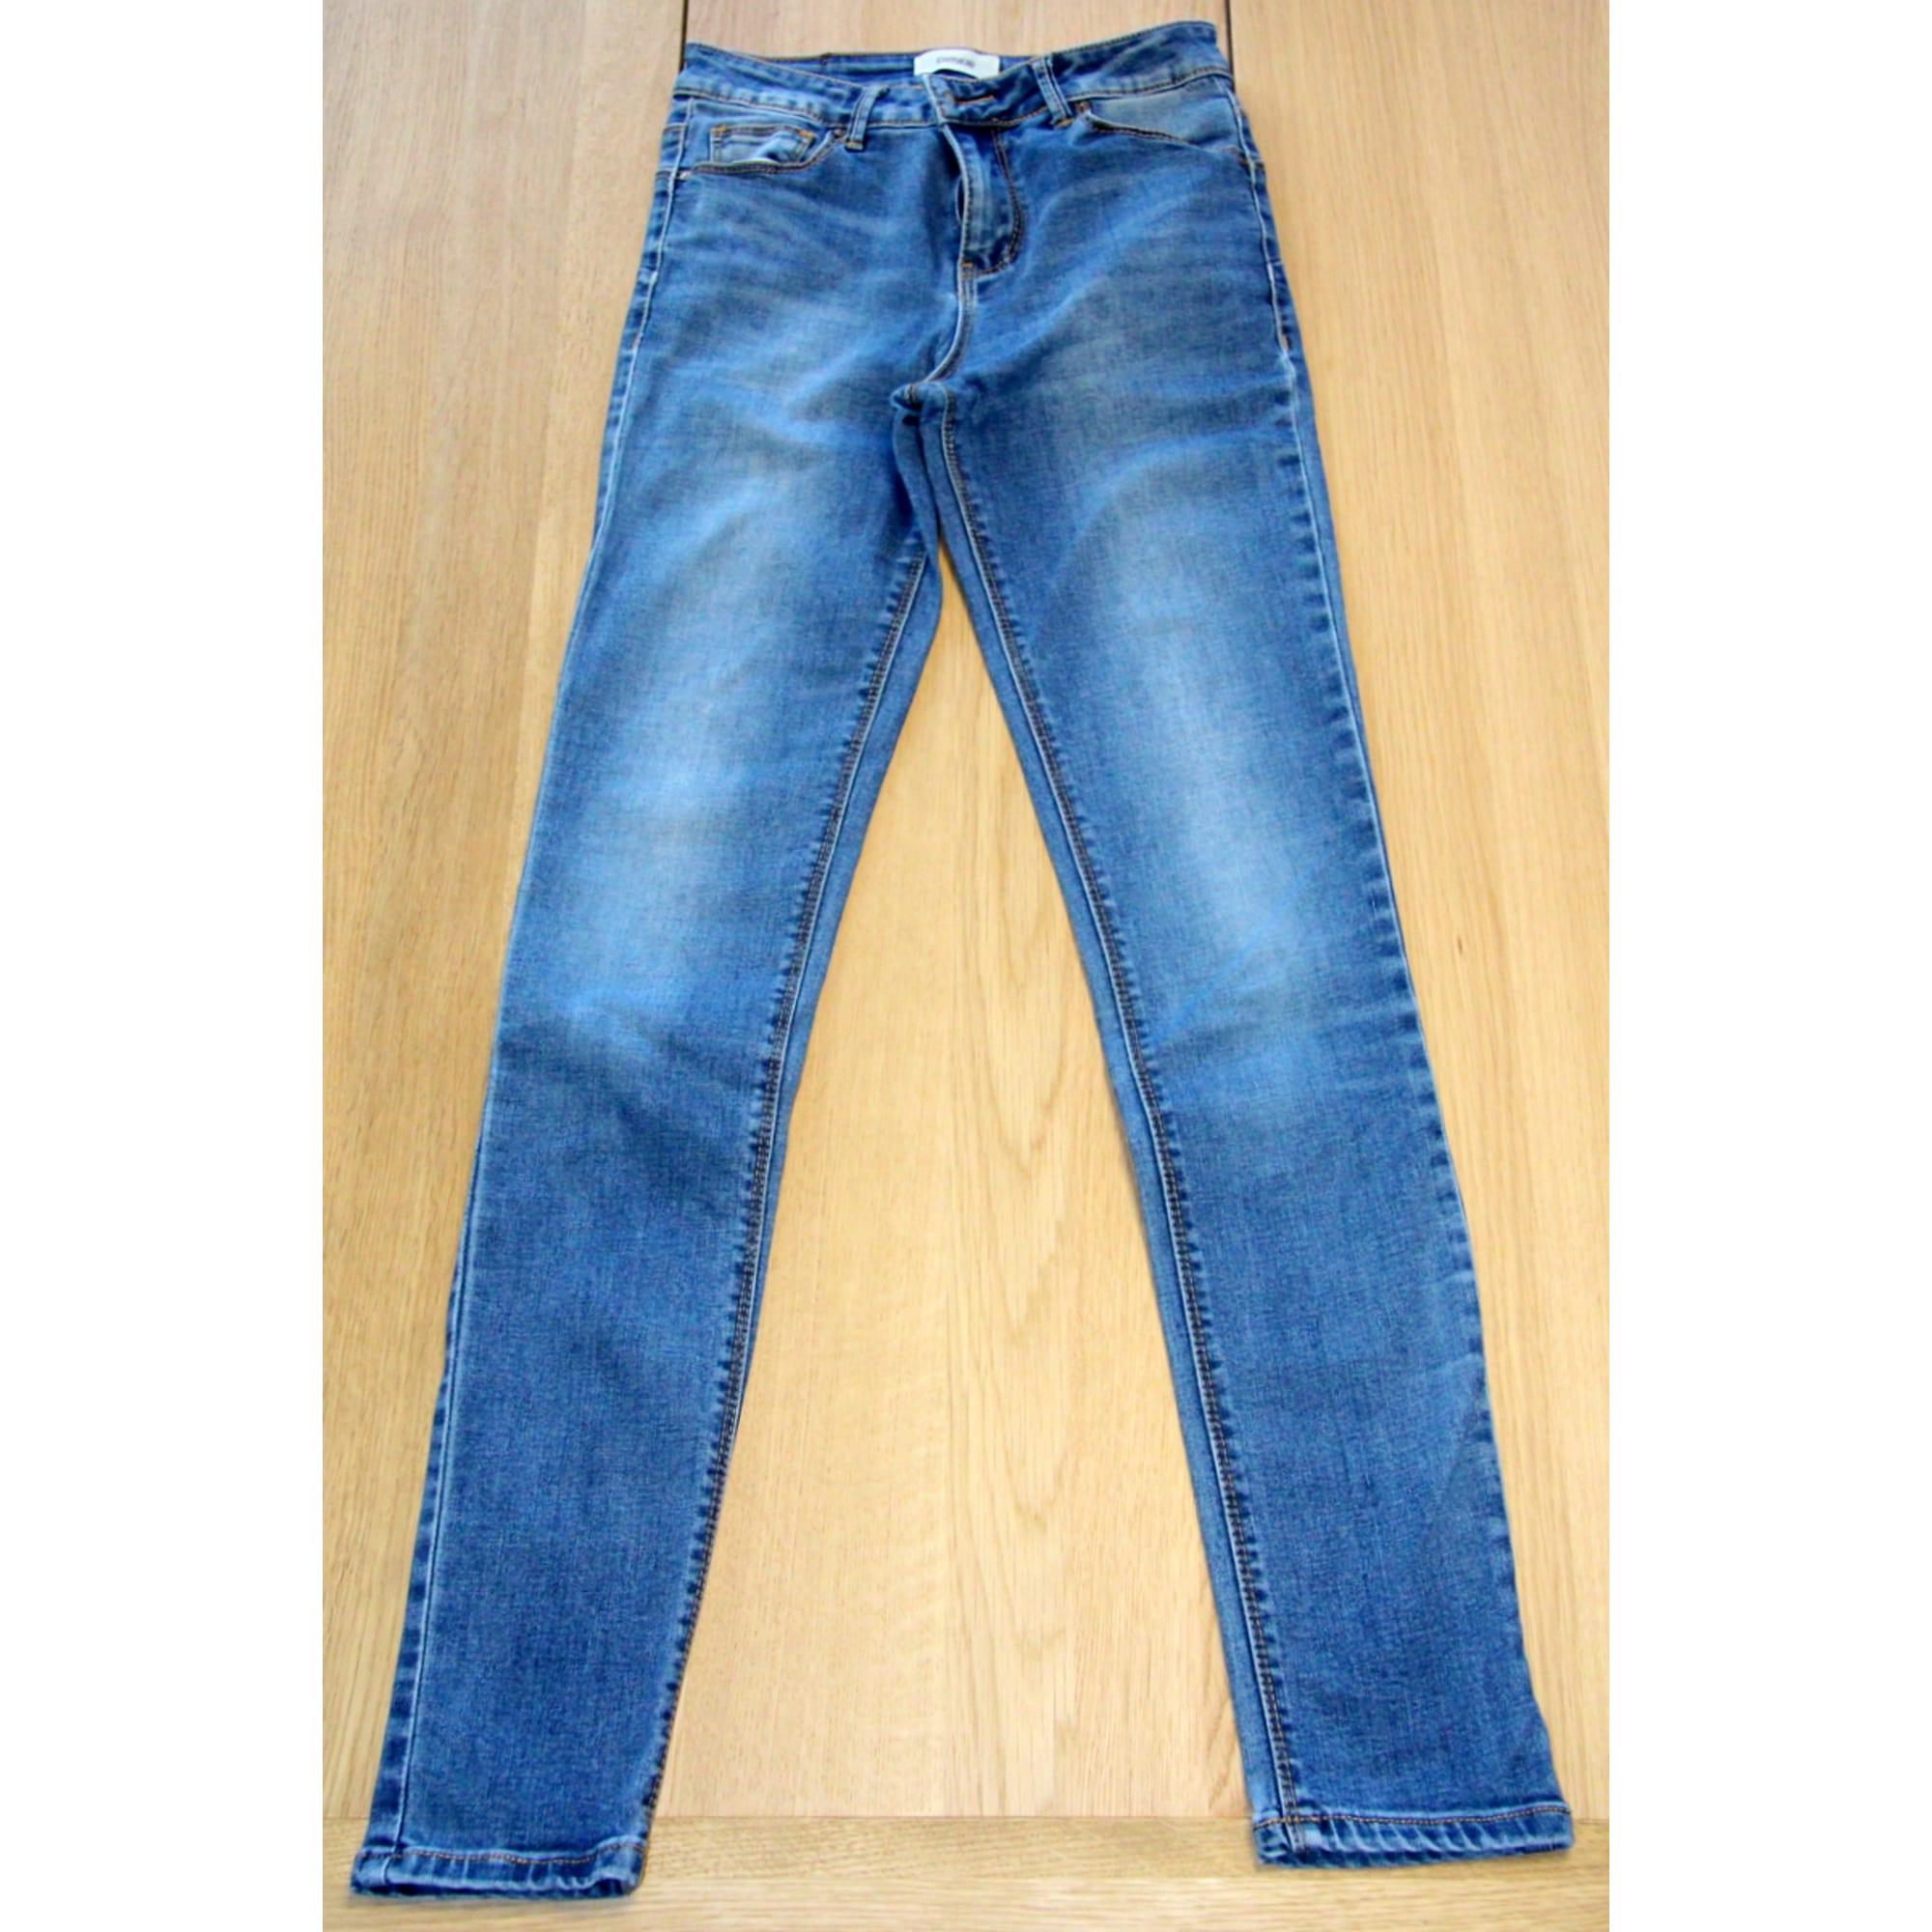 4d1e8bb8d8bc Jeans slim PIMKIE W25 (T 34) bleu - 8331284